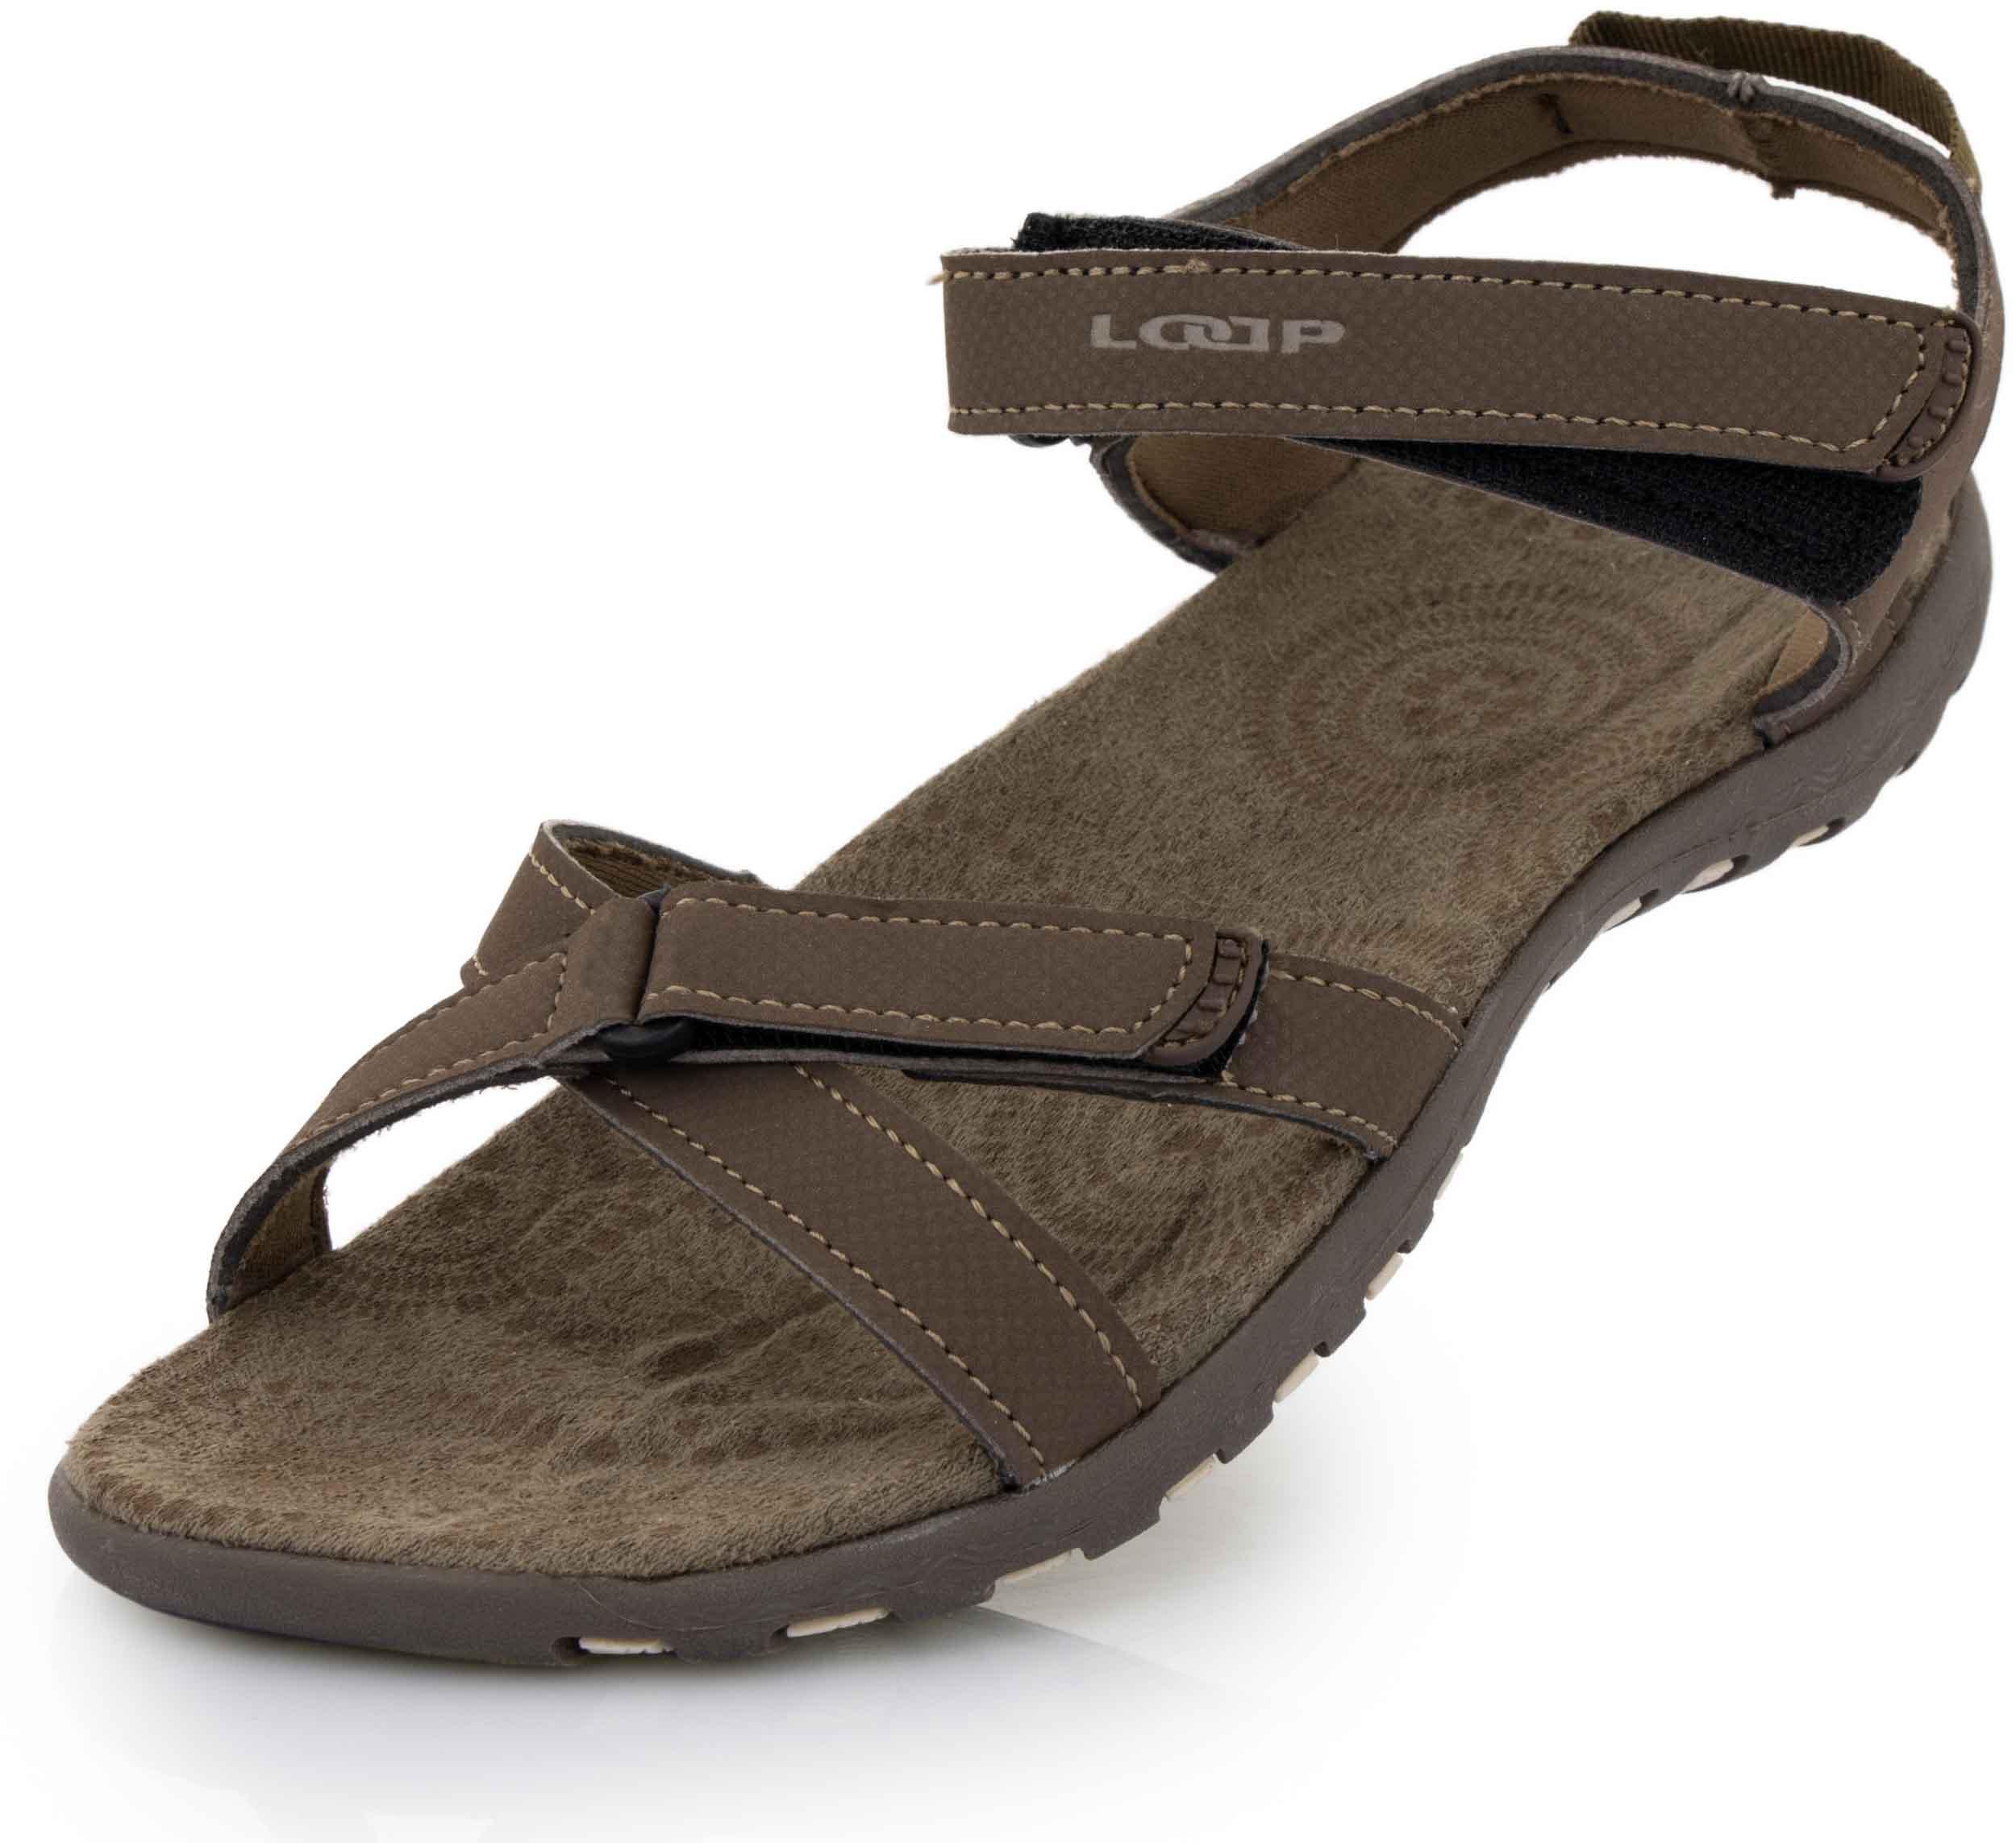 Dámské sandály Loap Simma